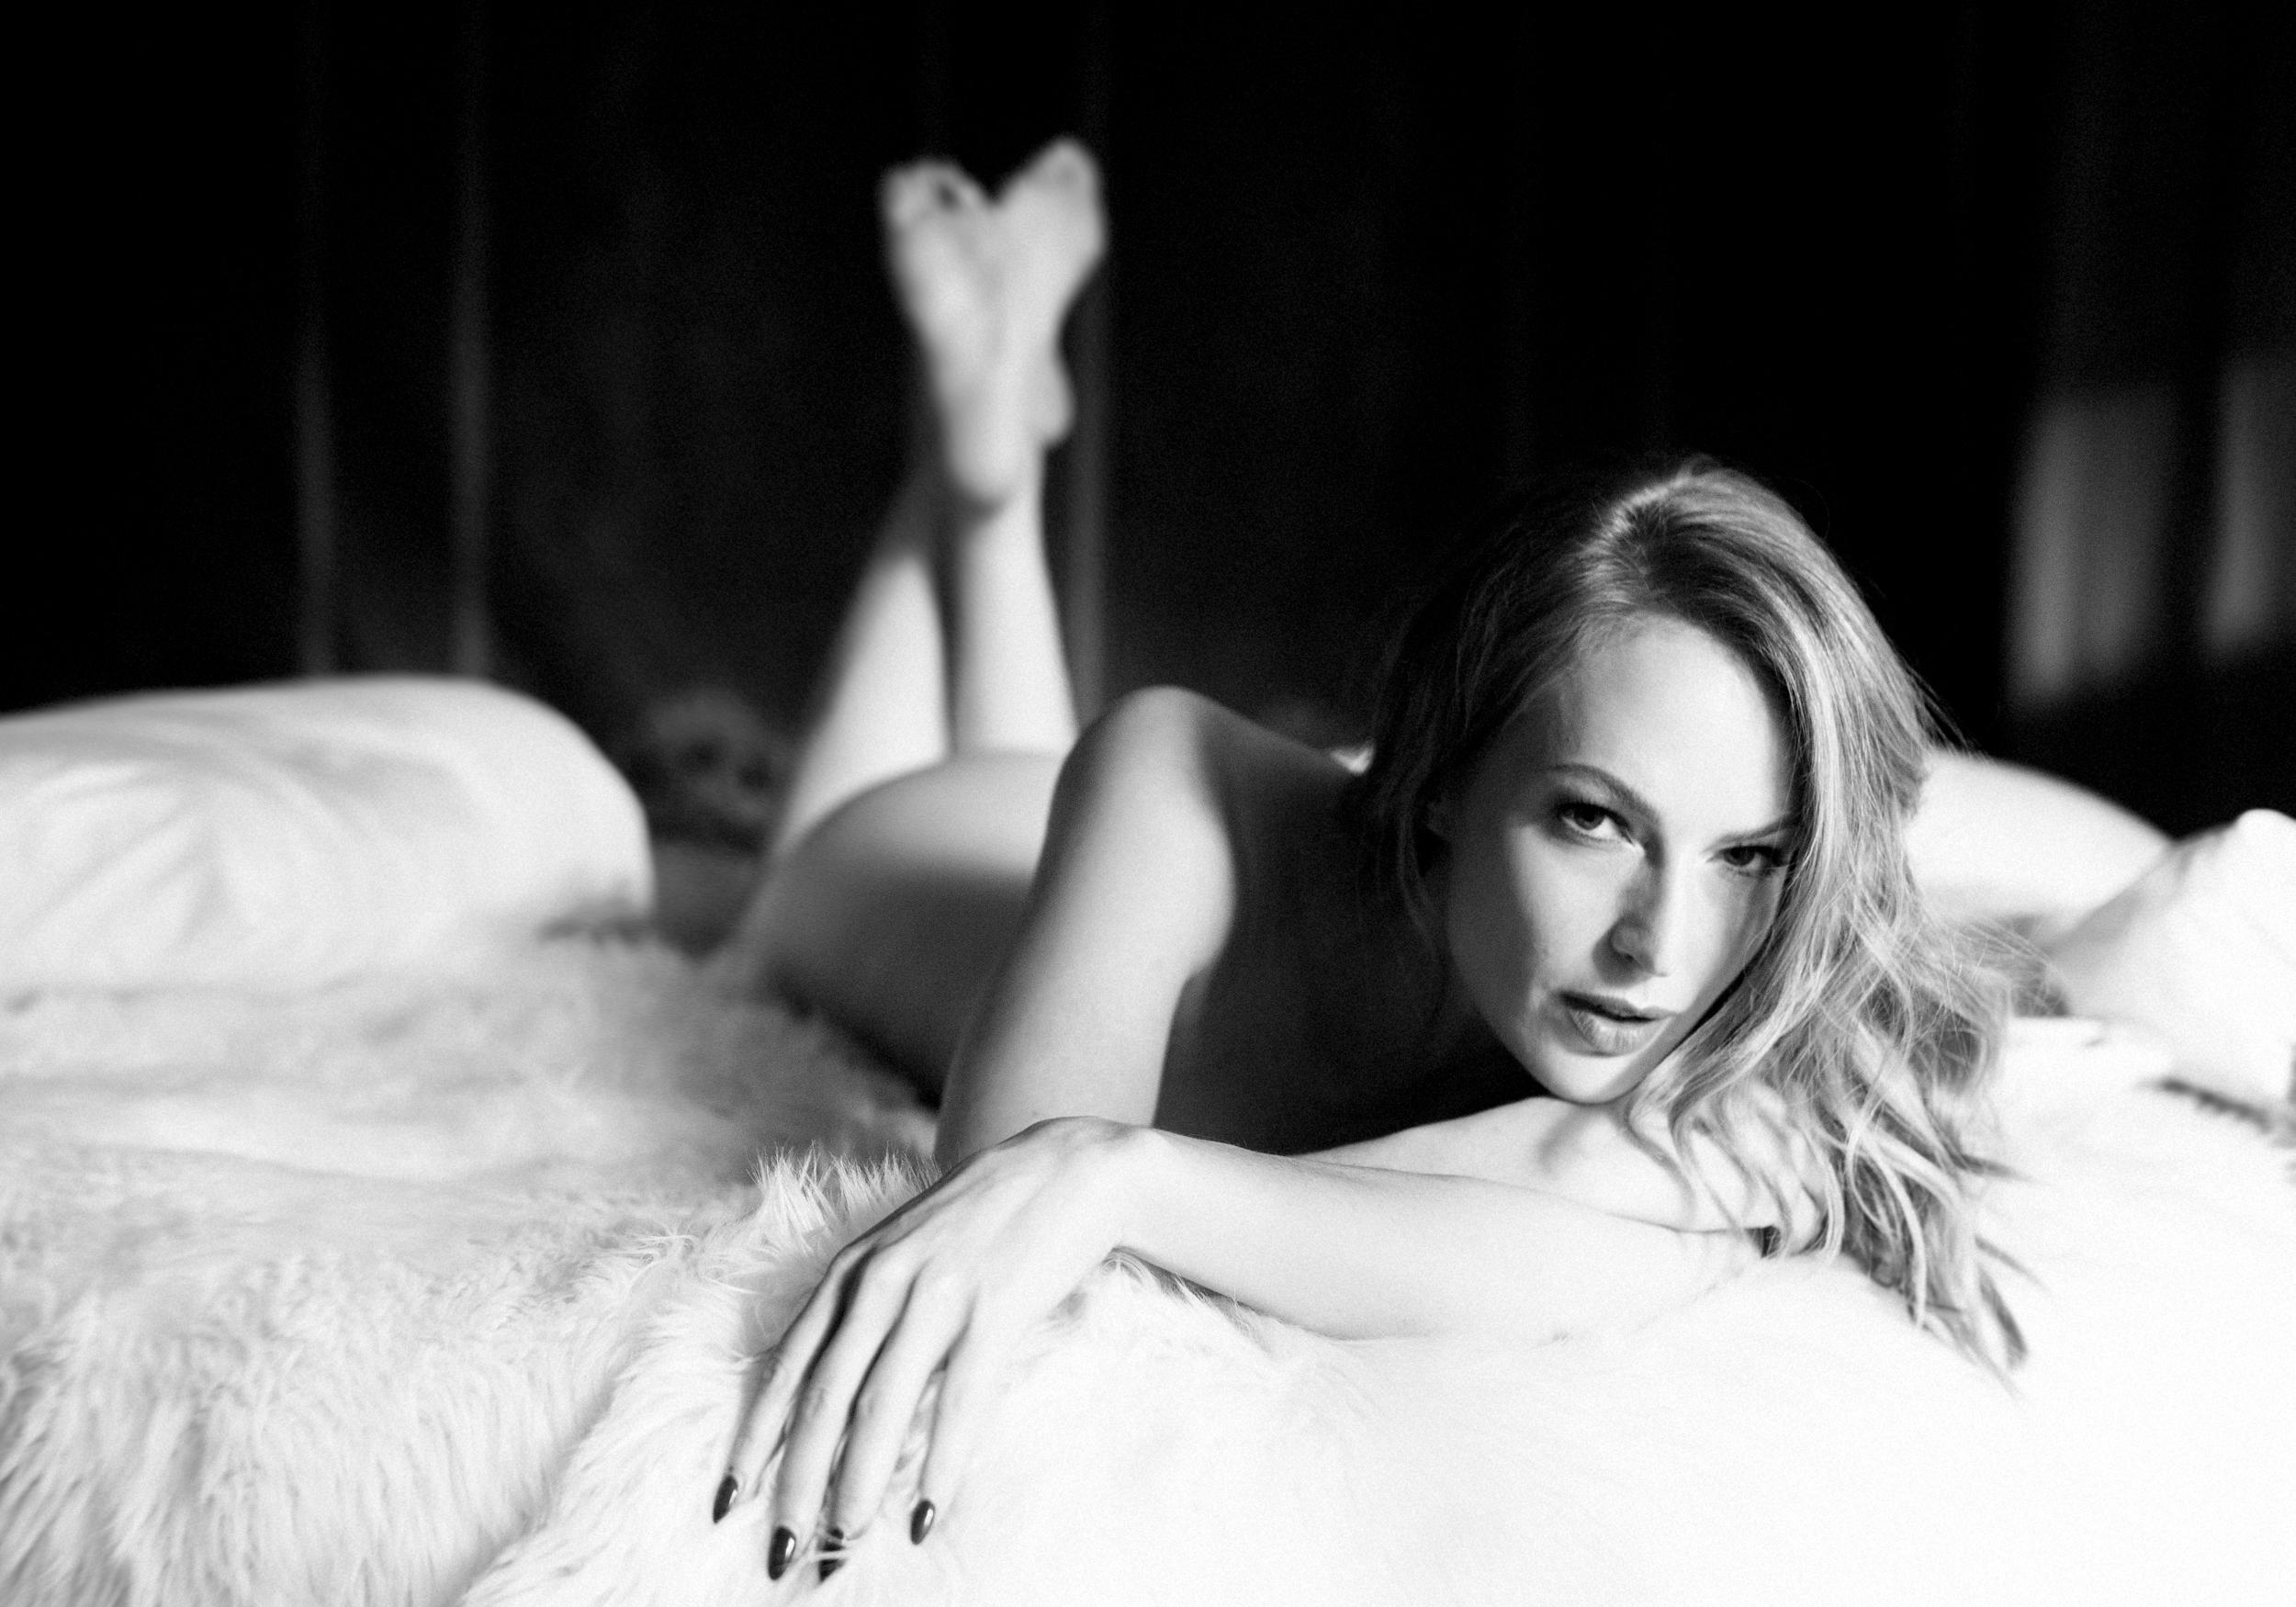 Boudoir-Photography-Victoria-Mra-2.jpg